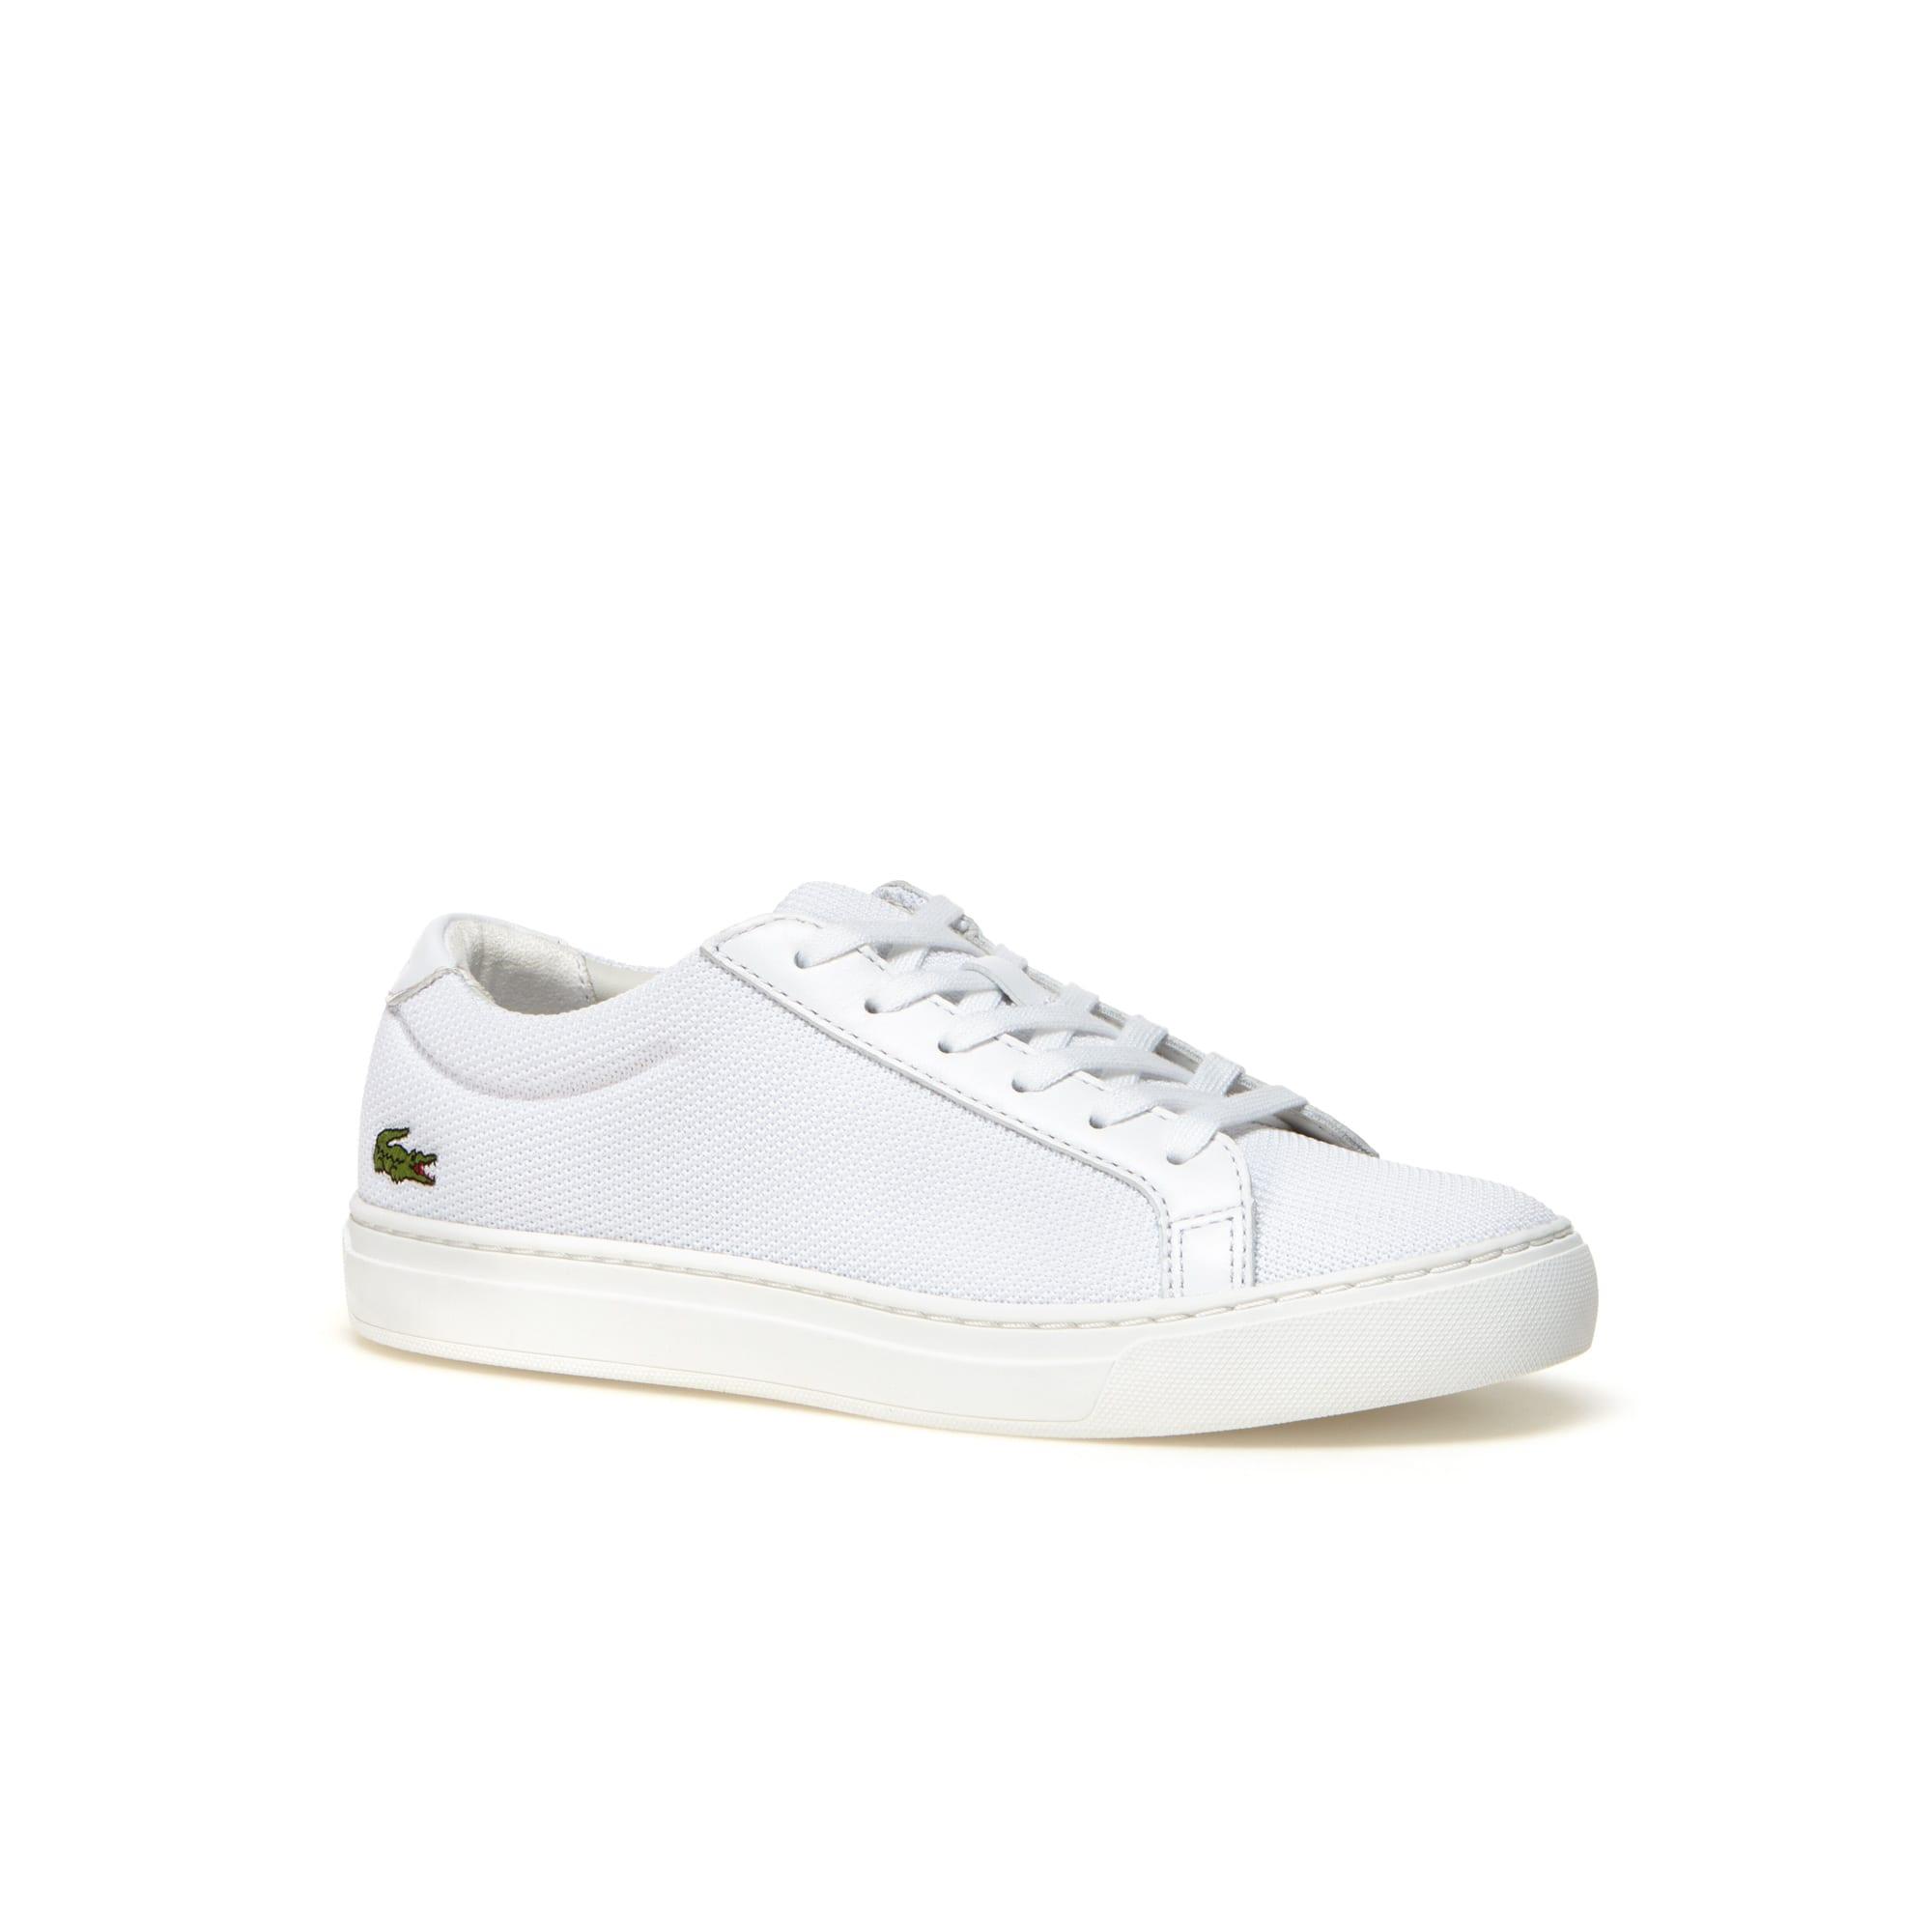 Women's L.12.12 Textile Sneakers